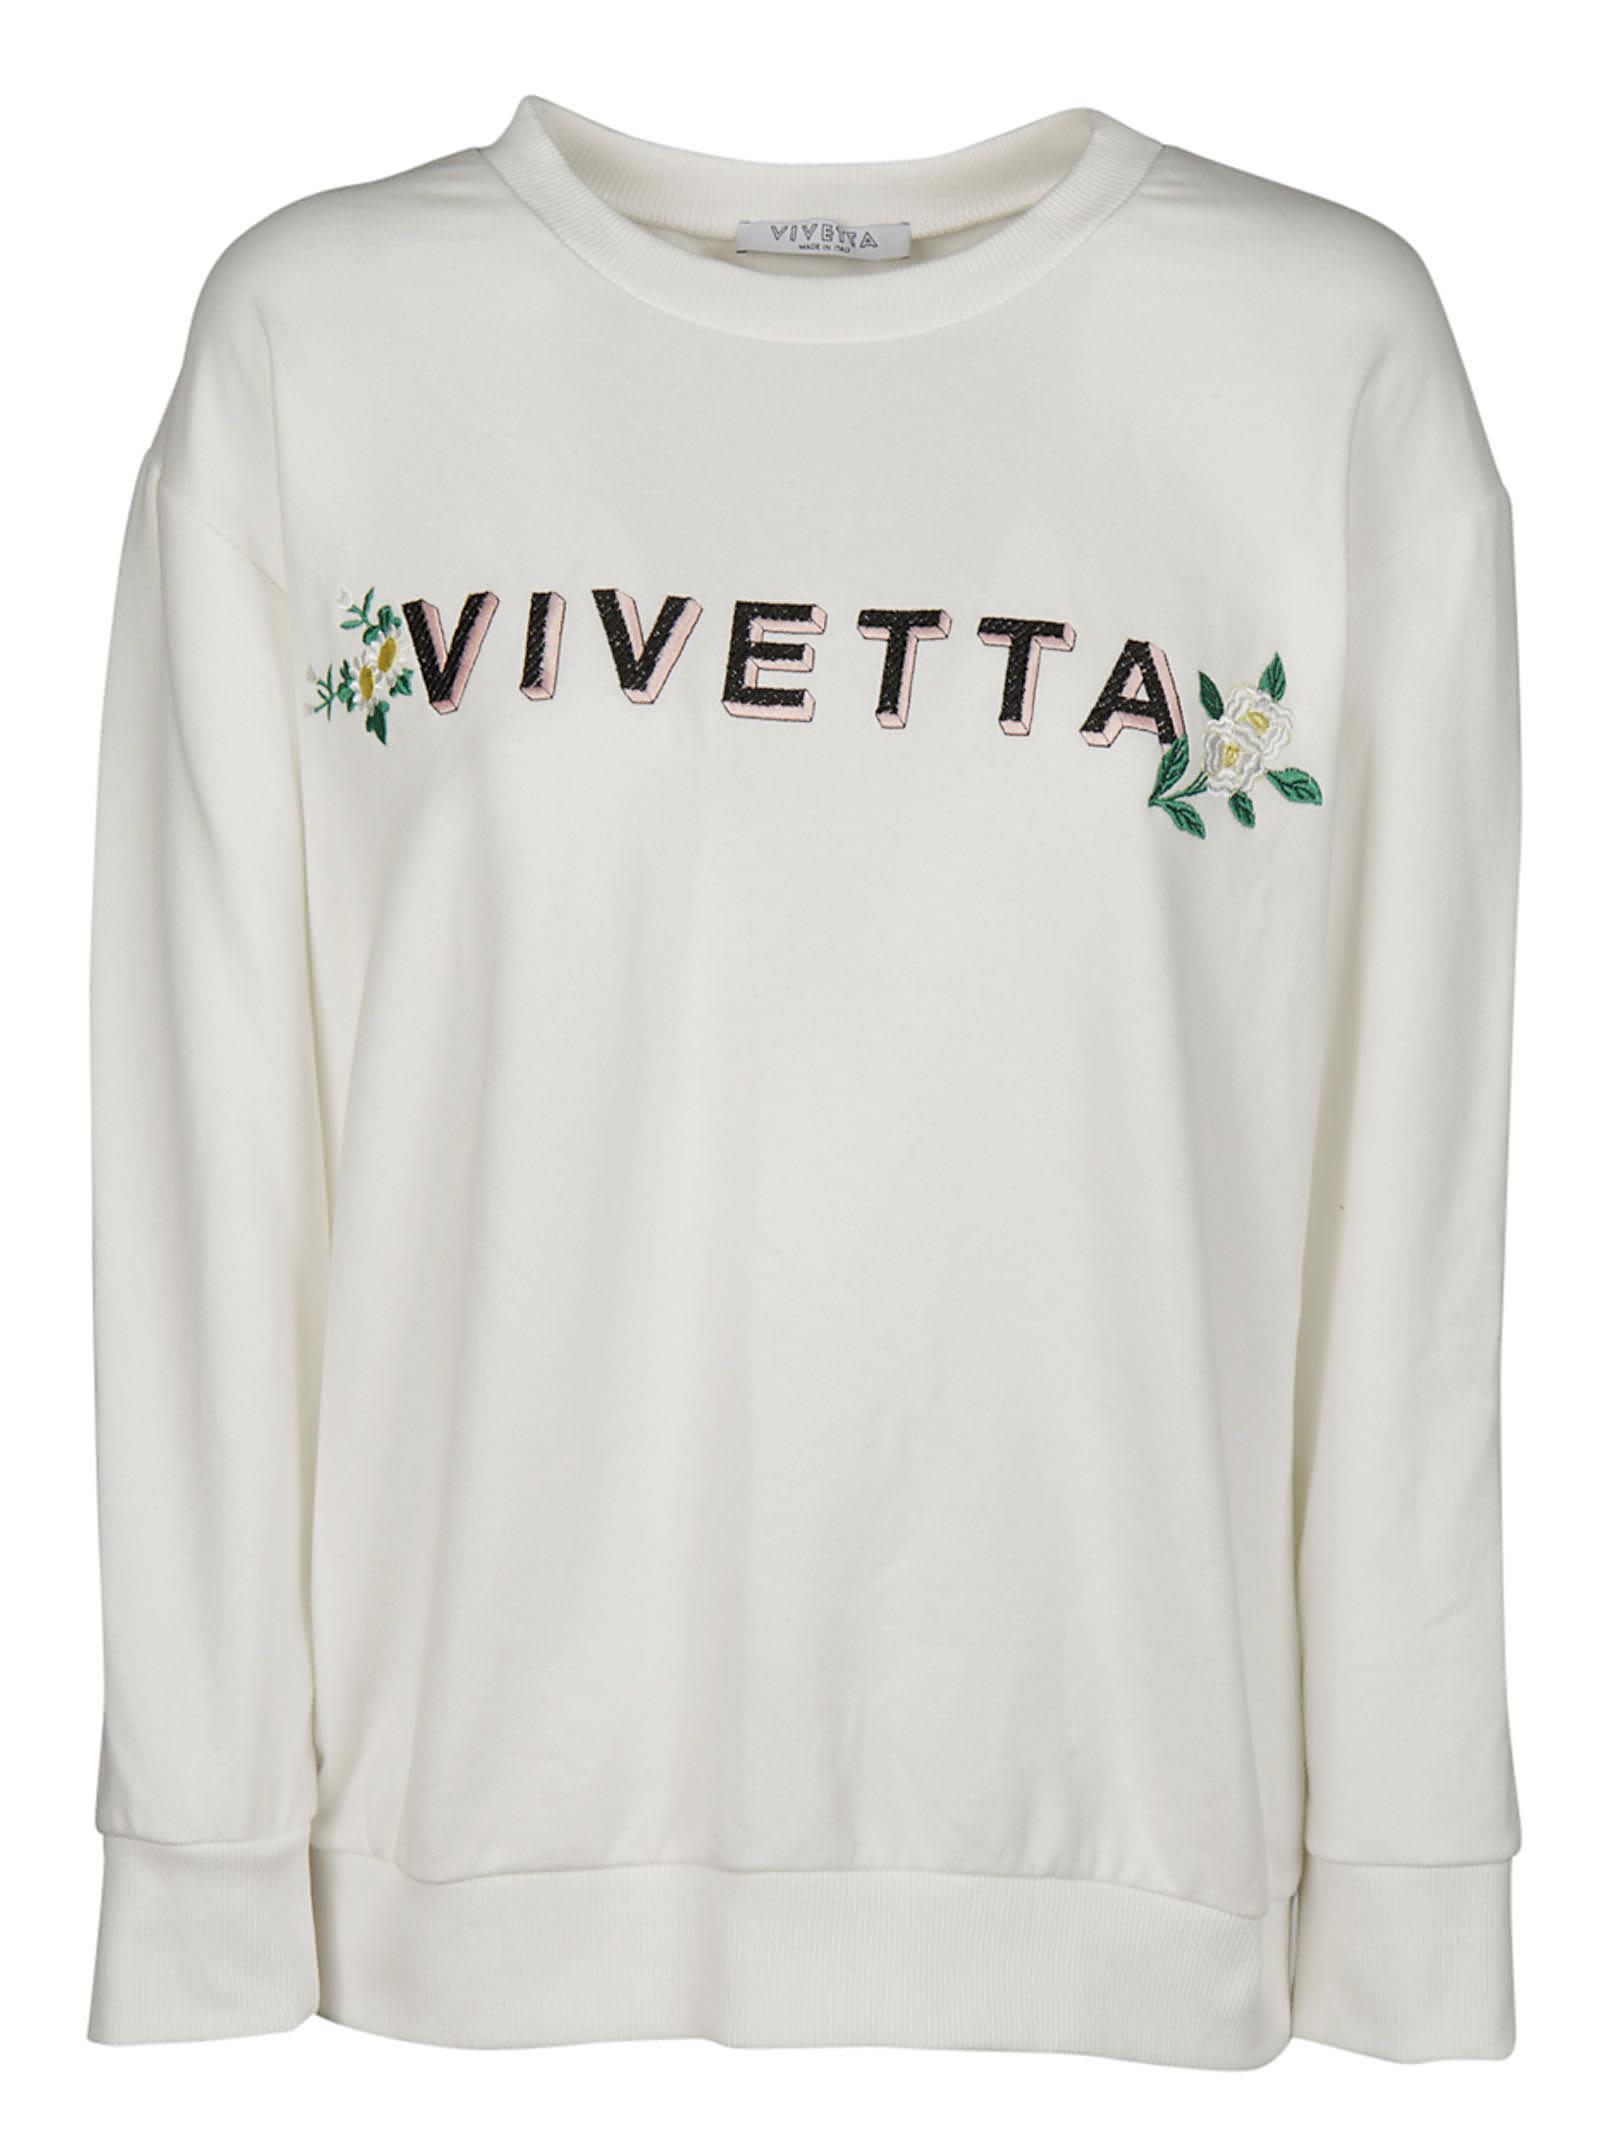 Vivetta Logo Embroidered Sweatshirt